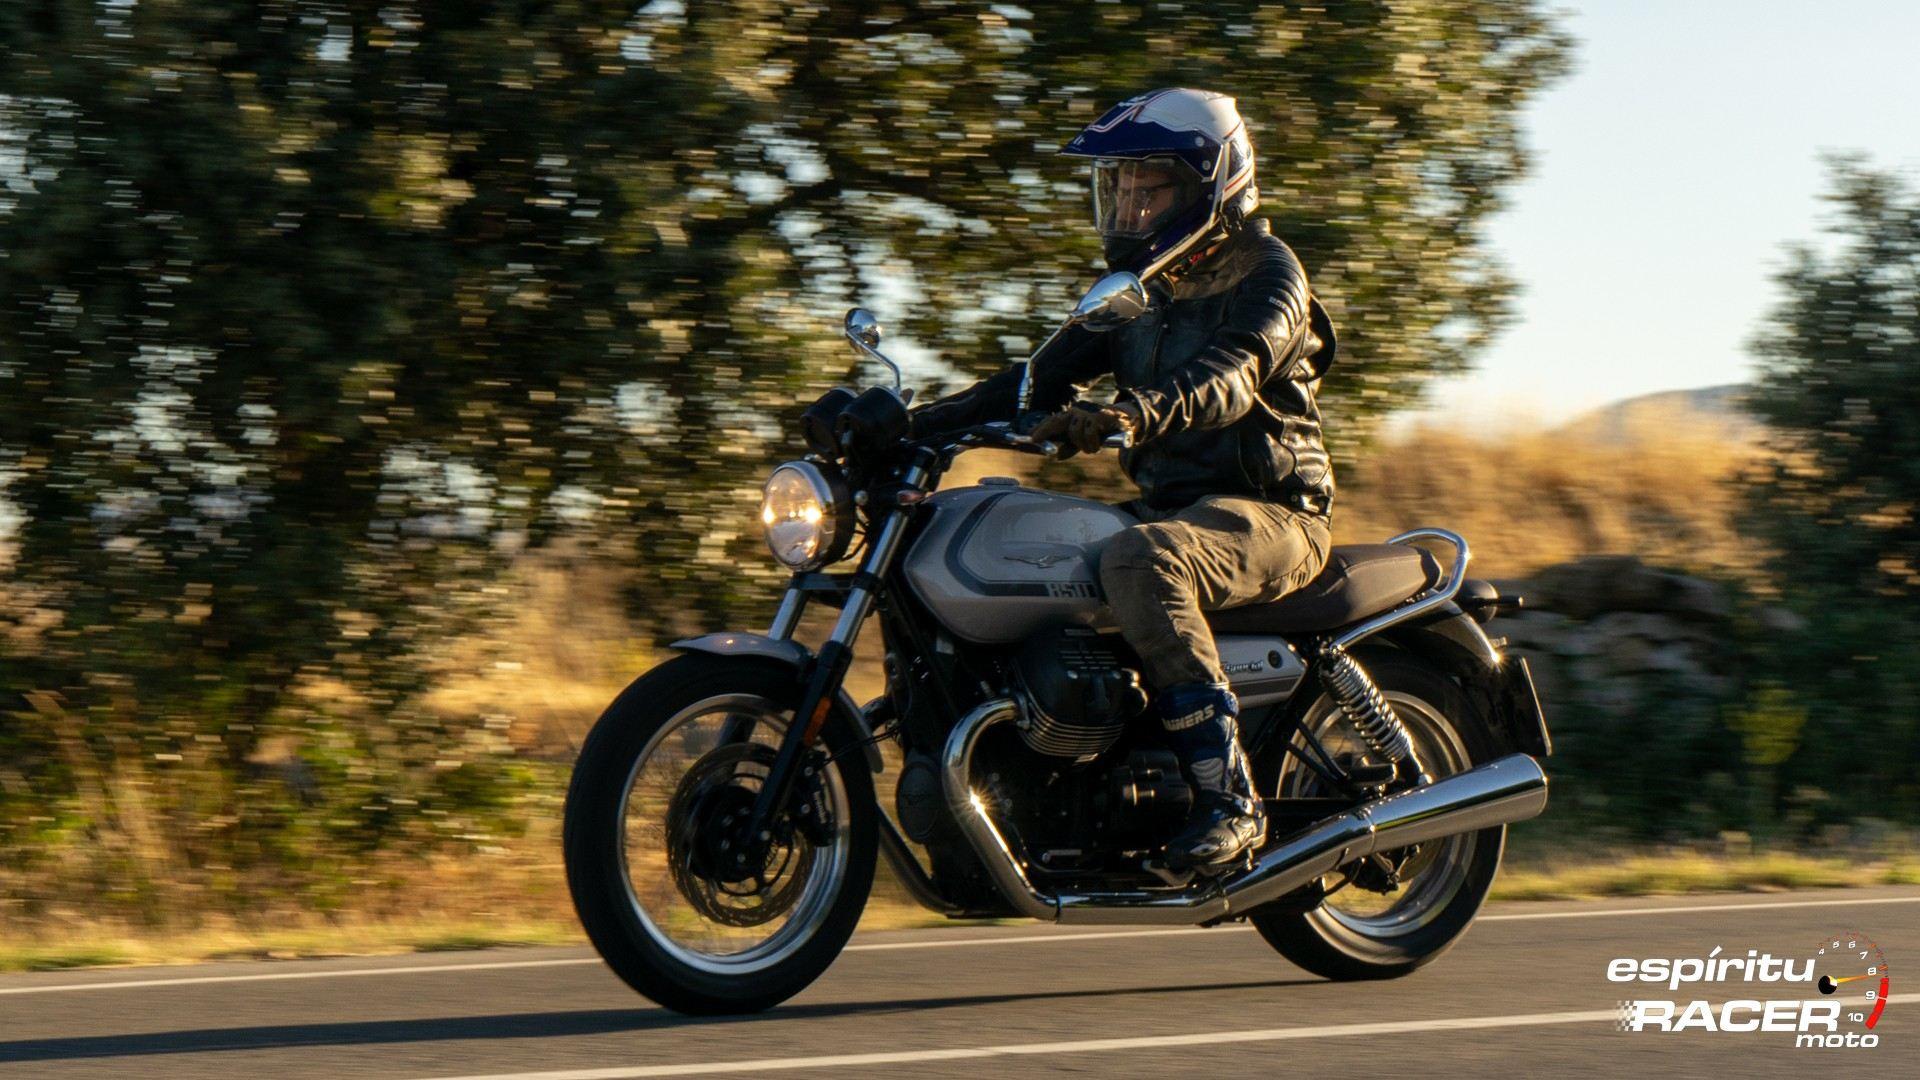 Moto Guzzi V7 850 Special 46